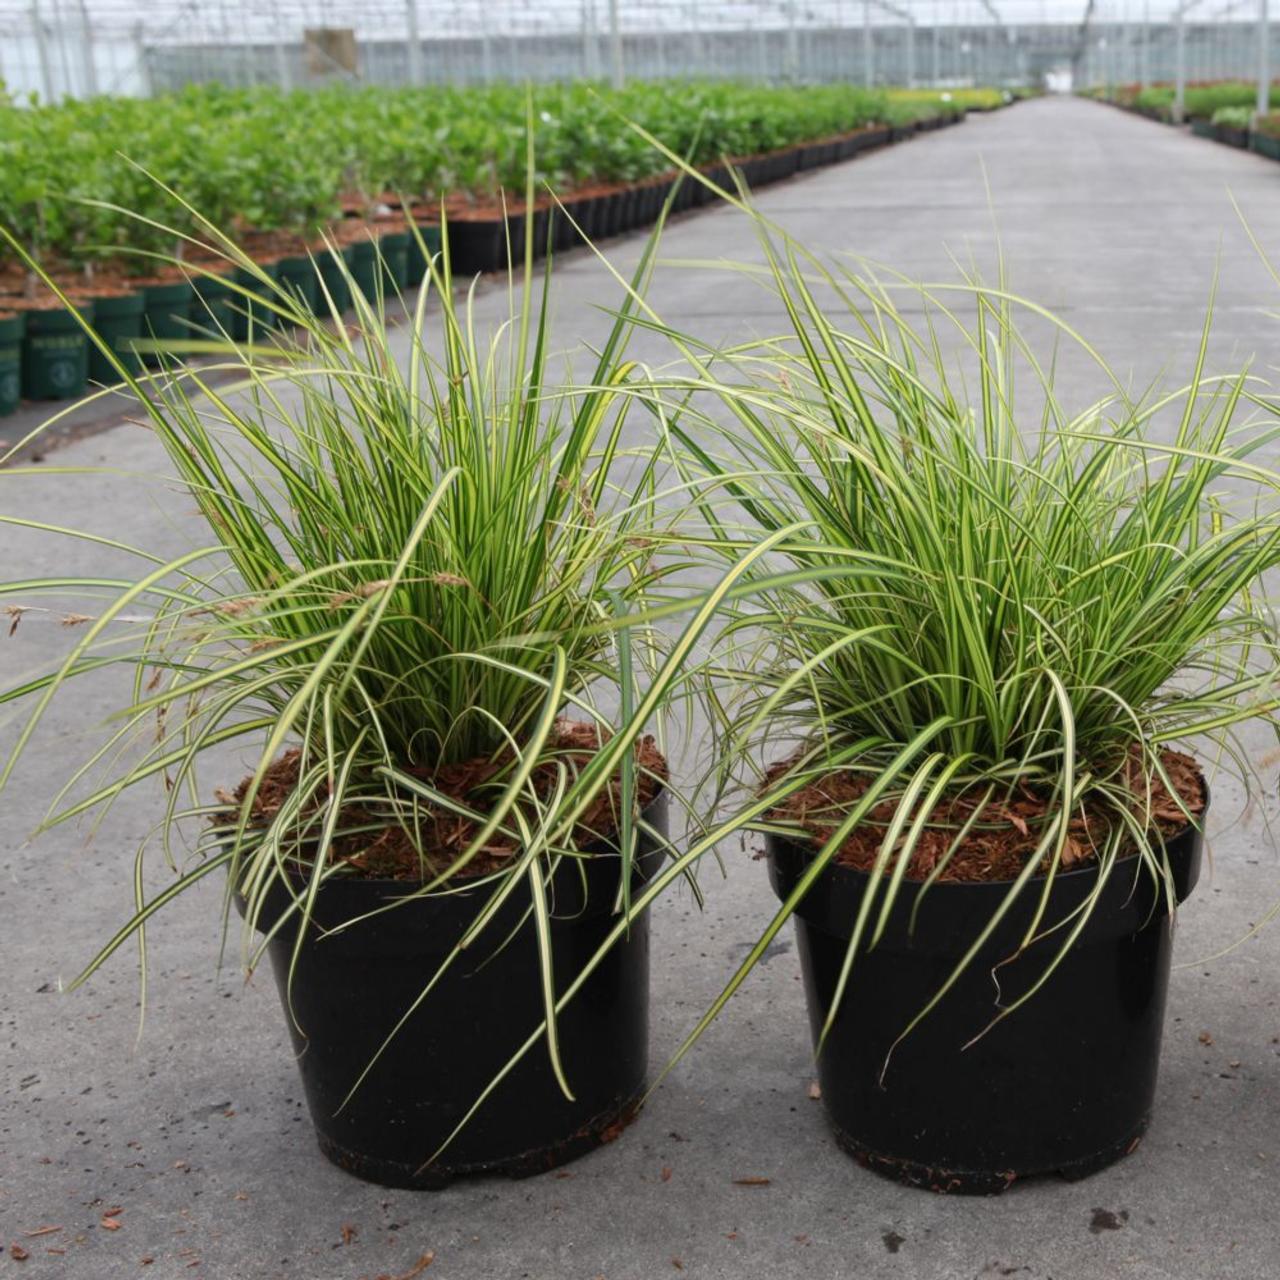 Carex oshimensis 'Eversheen' plant